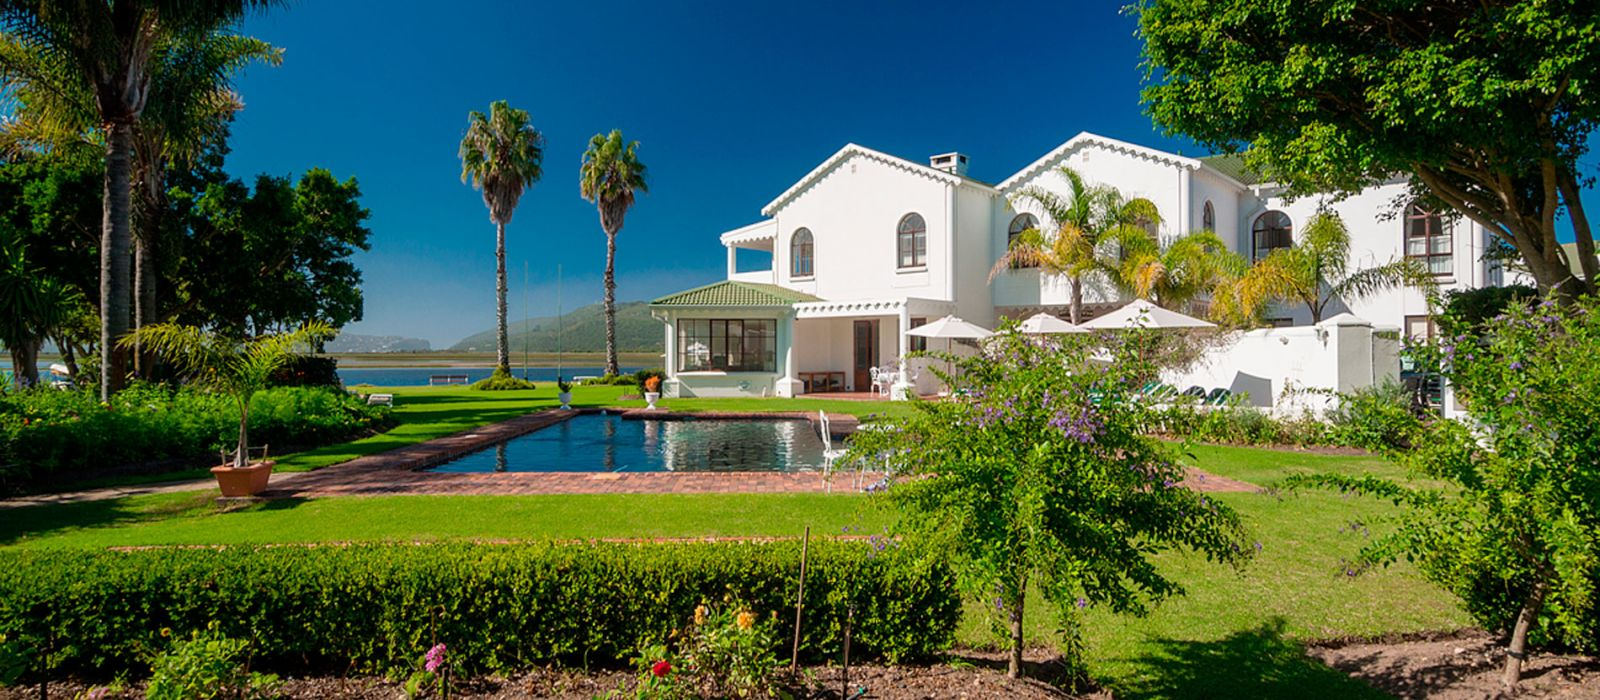 Hotel St. James of Knysna Südafrika